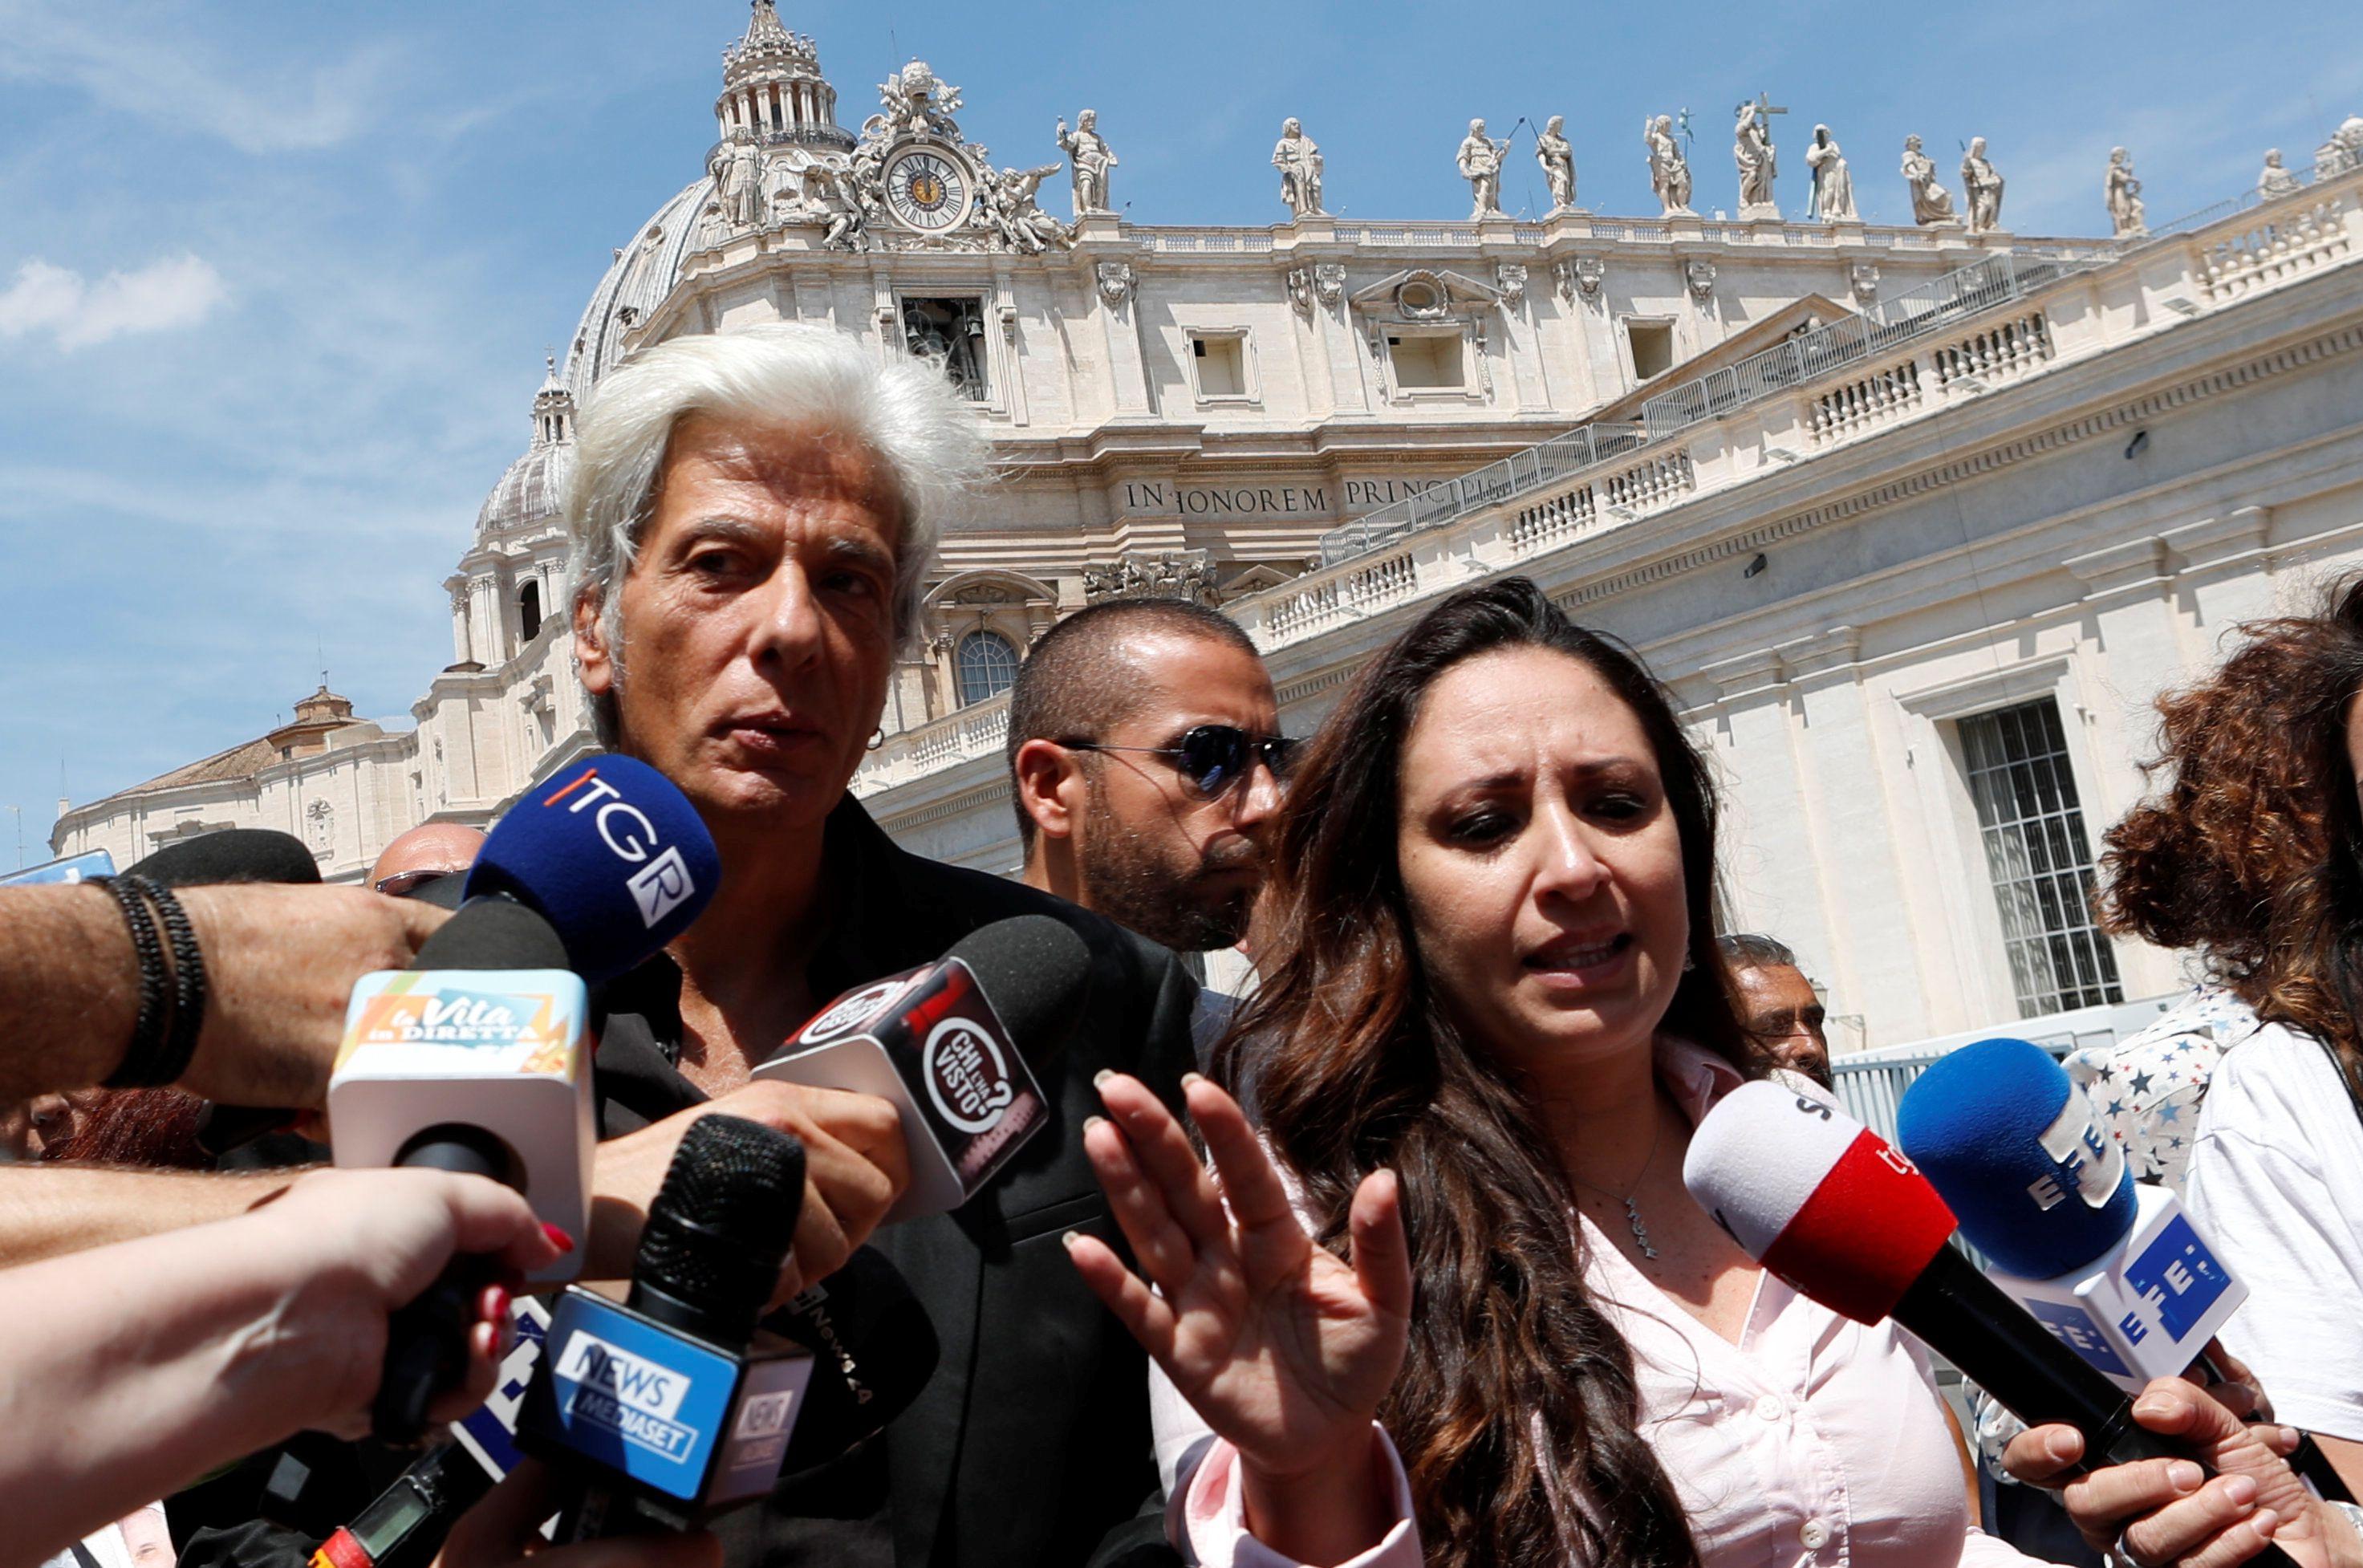 Pietro Orlanditras la apertura de las dos tumbas (Reuters/ Remo Casilli)